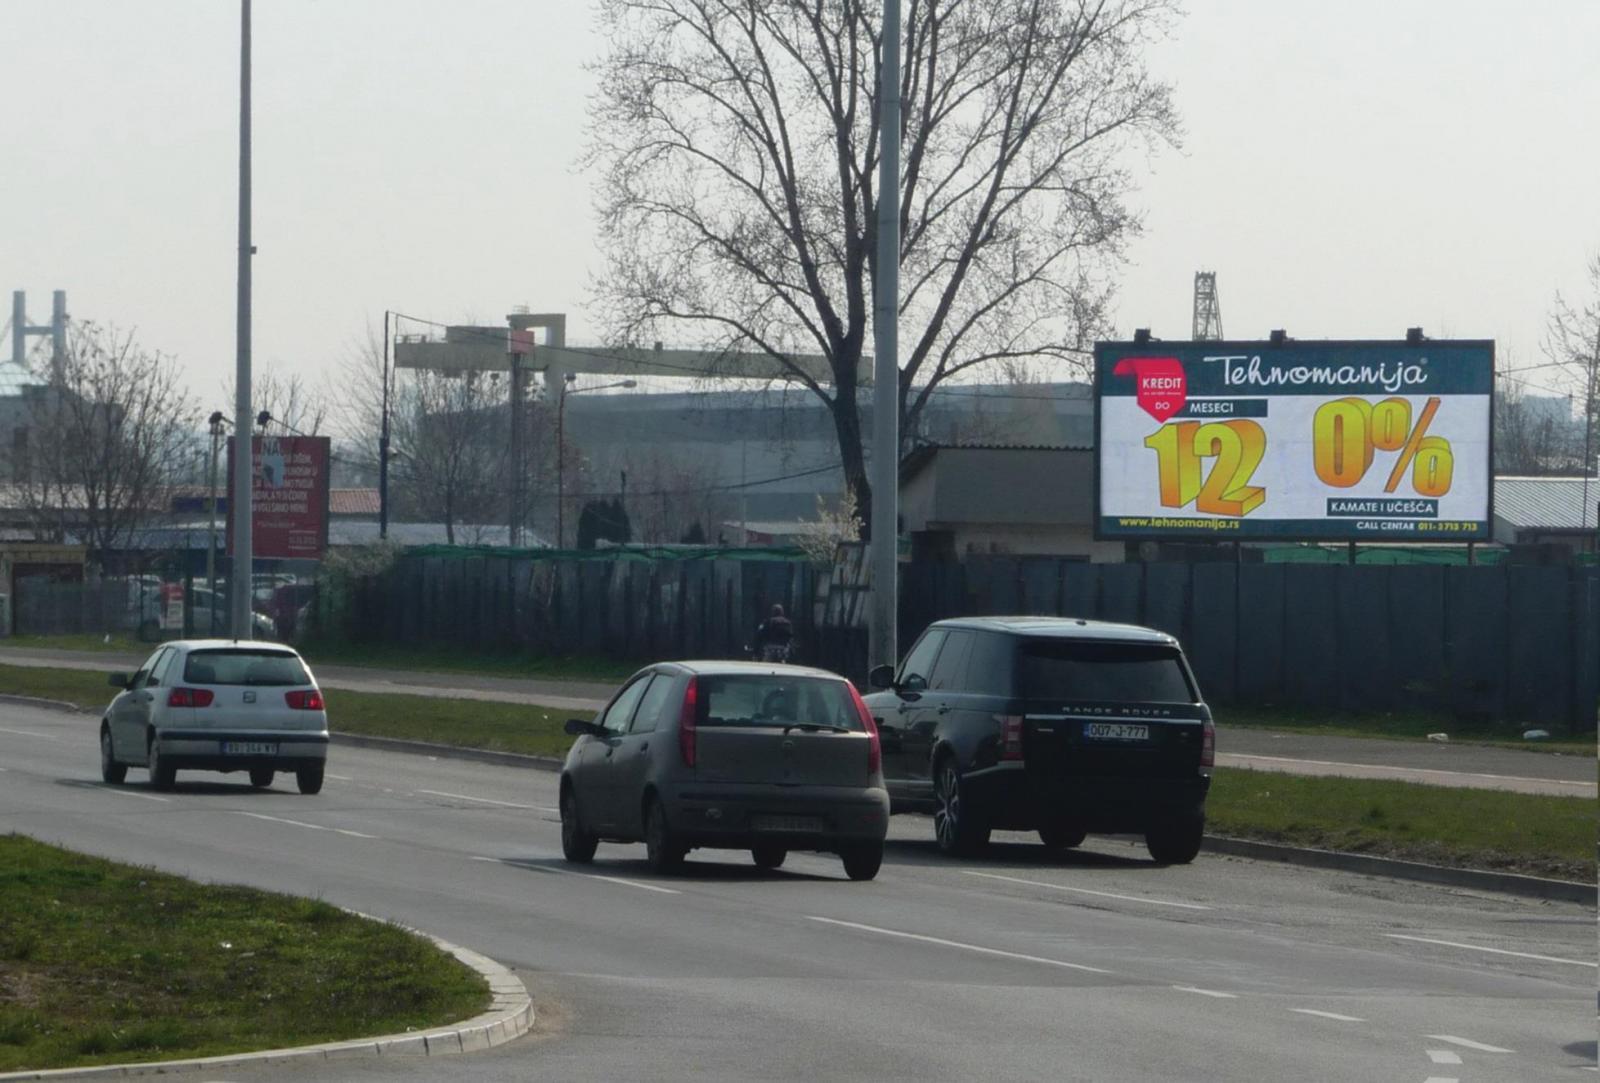 Bilbord Beograd BG-63